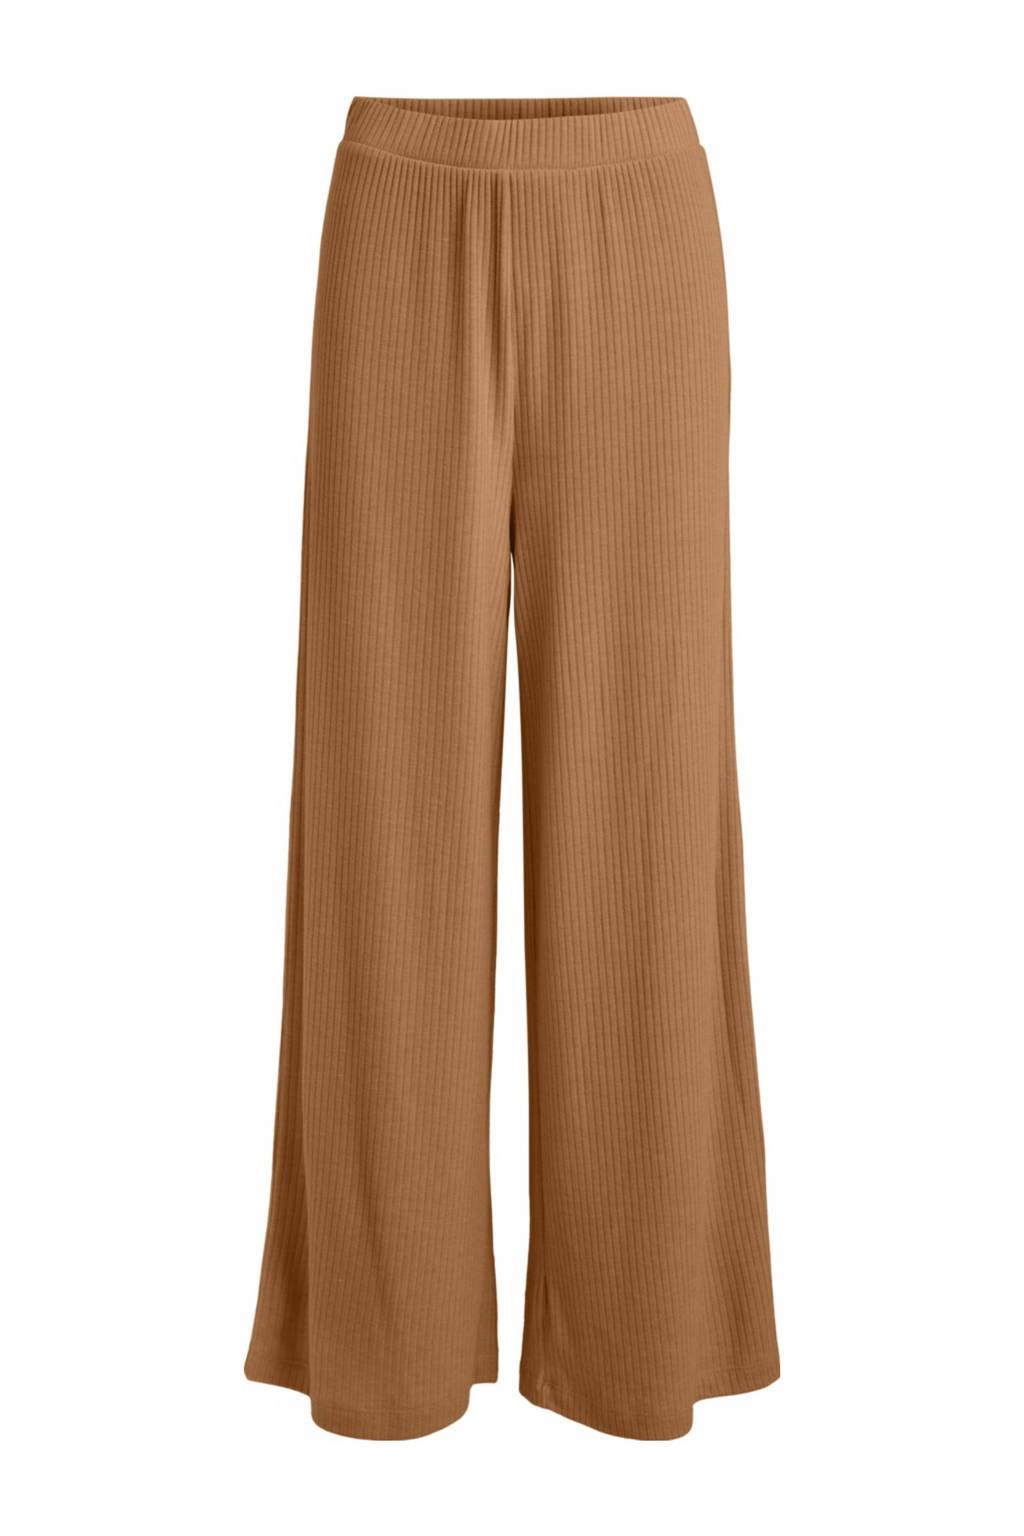 VILA high waist wide leg palazzo broek VIRIBBI  van gerecycled polyester bruin, Bruin